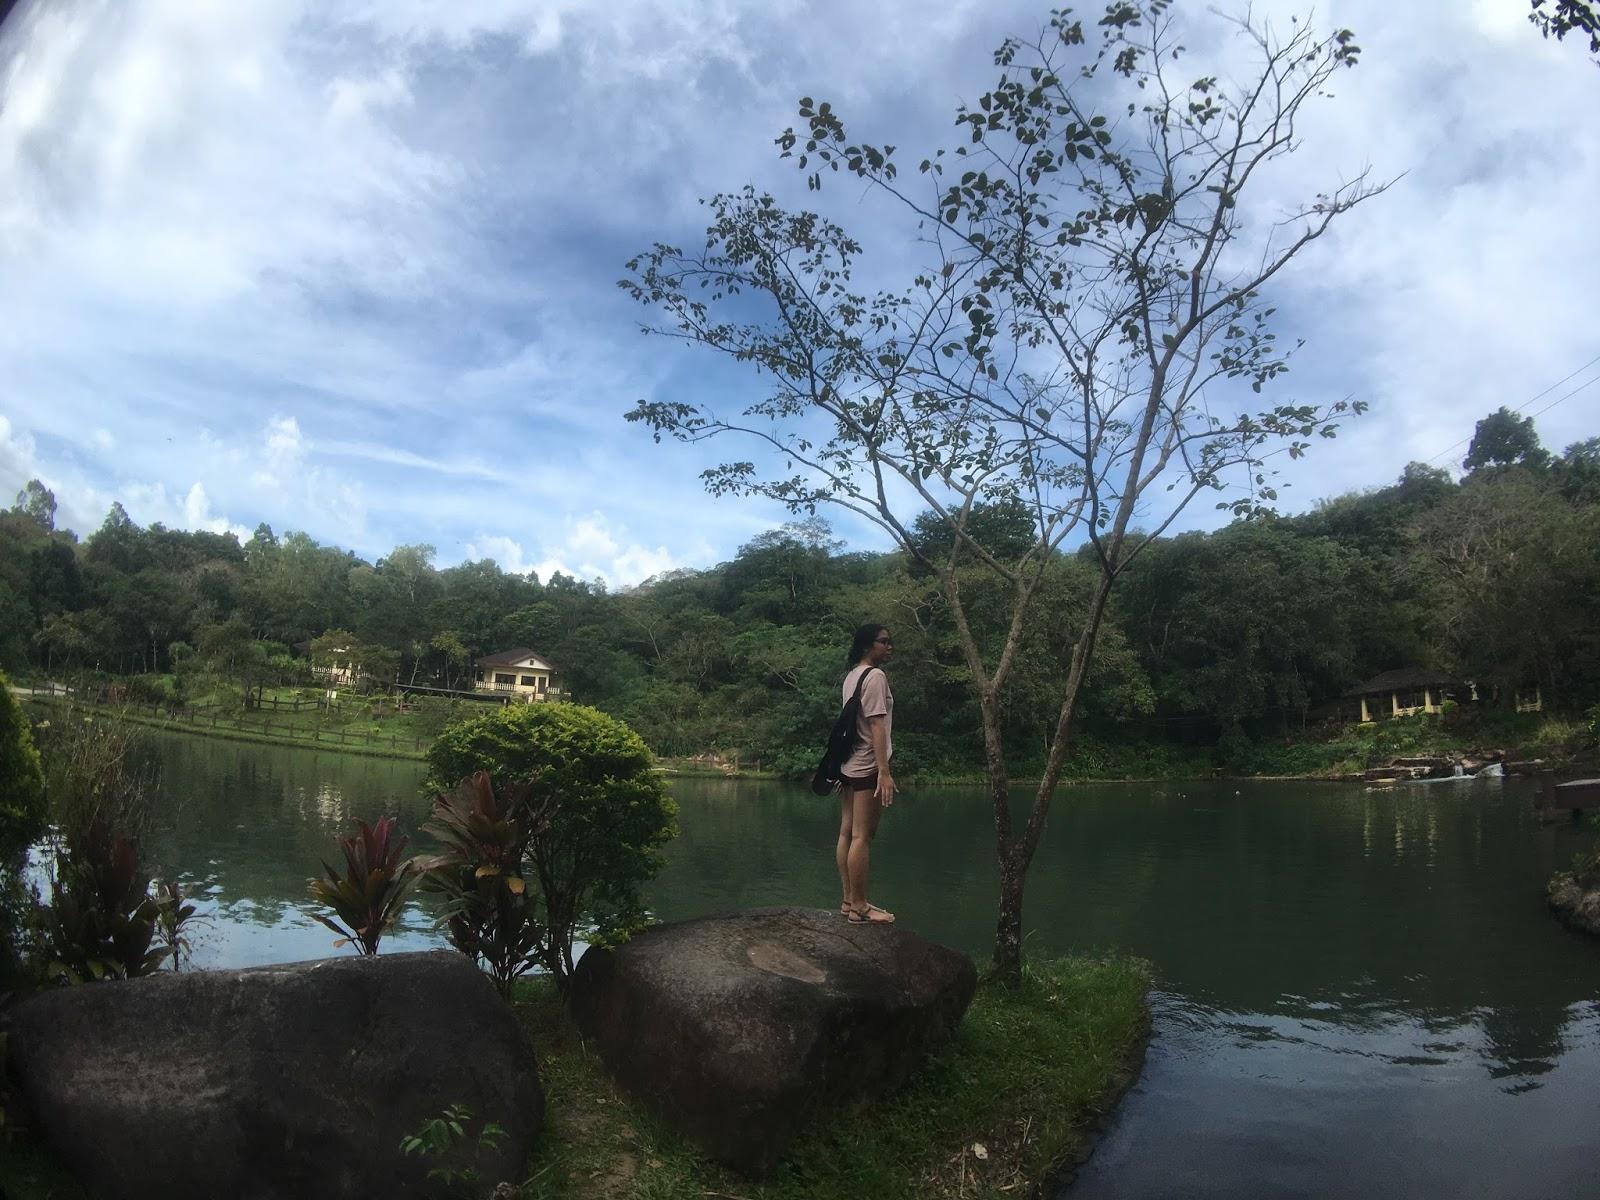 Negros Occidental A day in Mambukal Resort - KZ traveldotcom